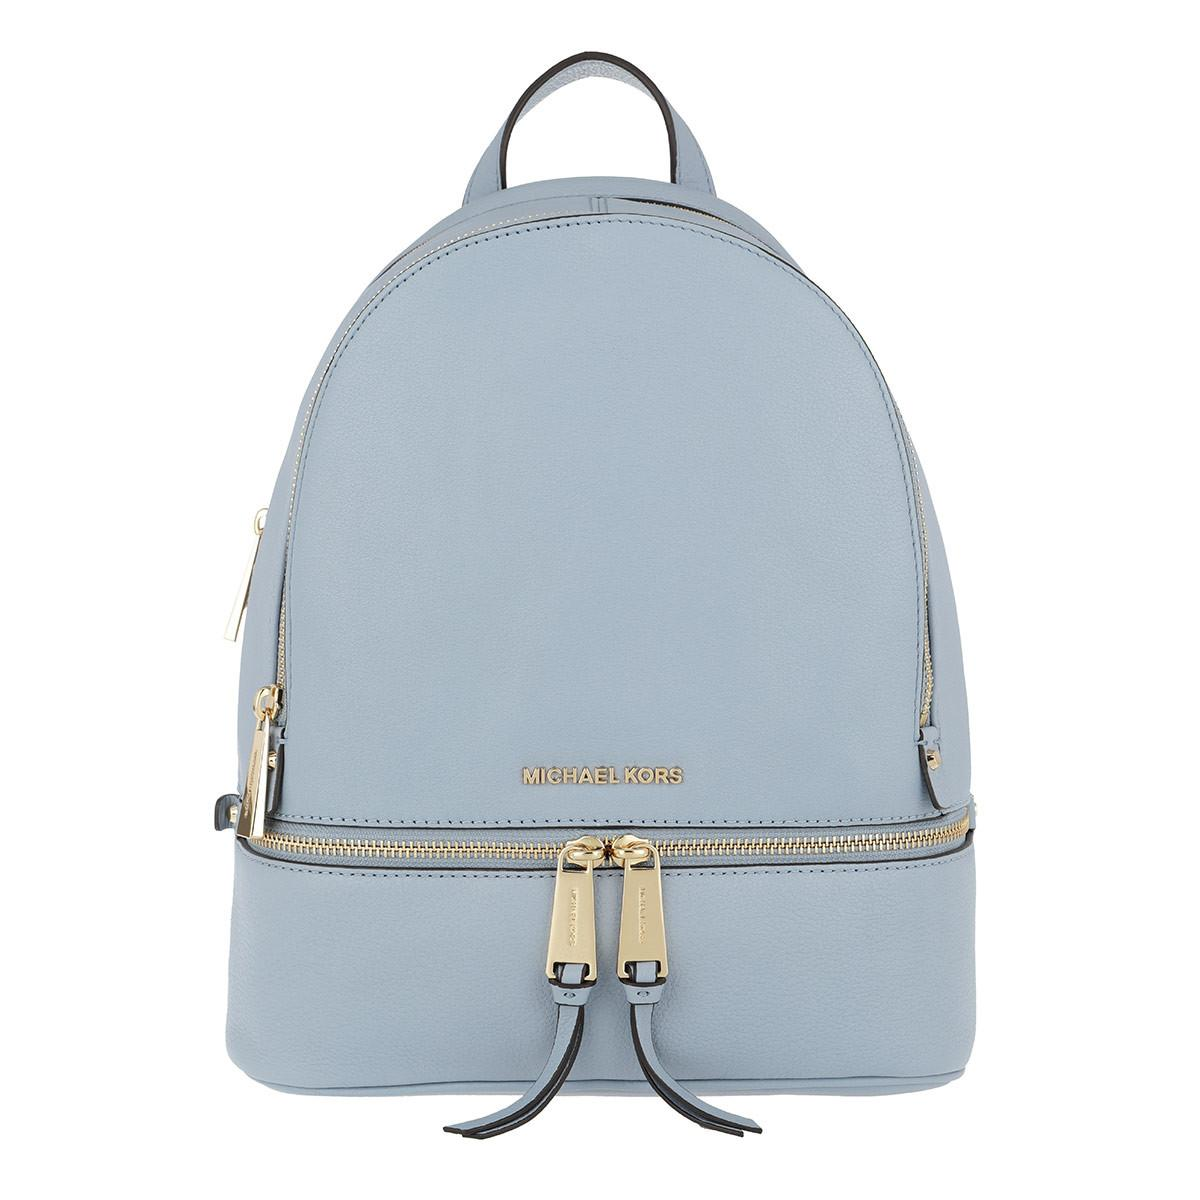 4117a29a1ec2 Michael Kors - Rhea Zip Medium Backpack Pale Blue - Lyst. View fullscreen